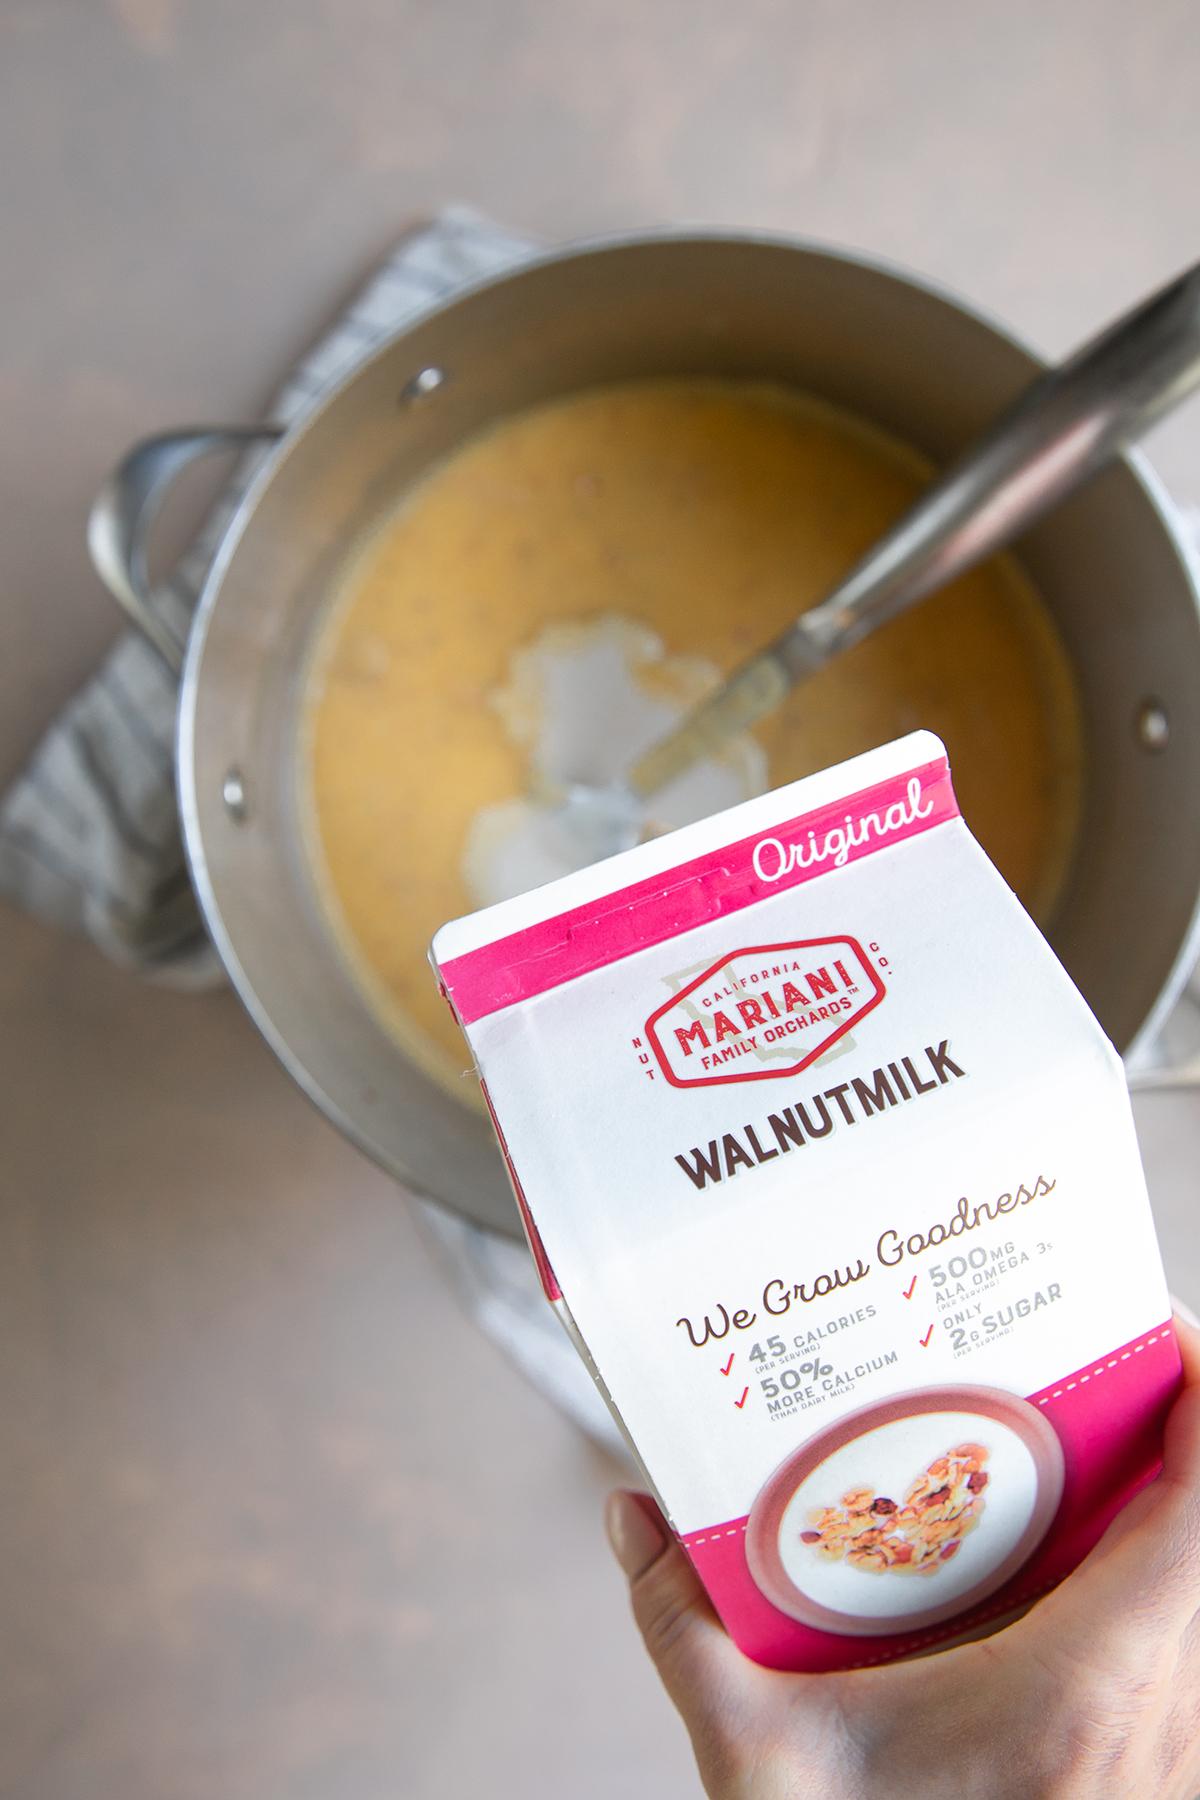 HR Walnutmilk Potato Leek Soup-2.jpg